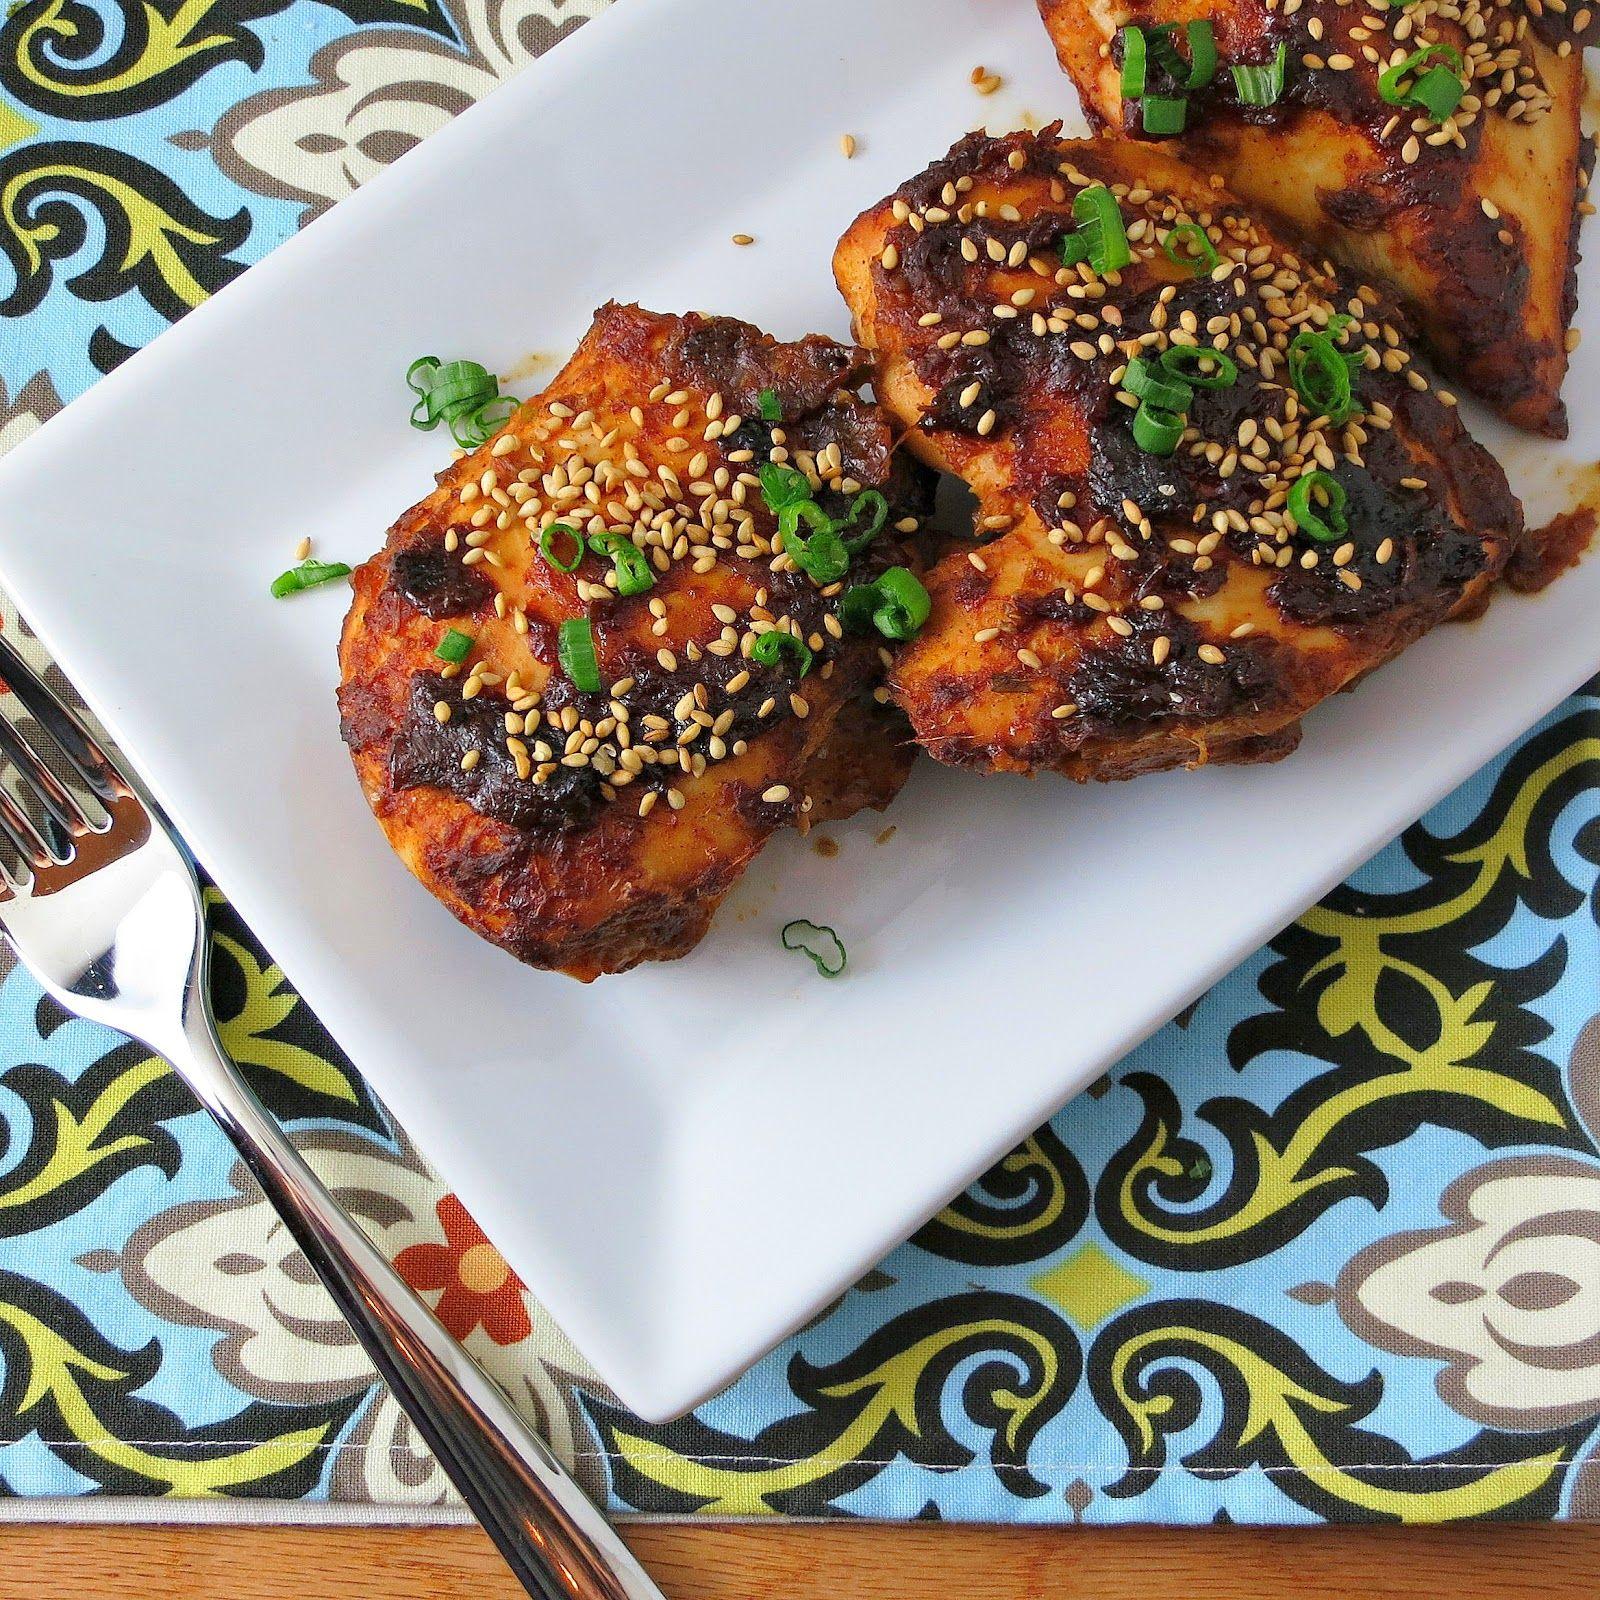 Oven Baked Sriracha Chicken Recipe With Garlic, Ginger & Hoisin